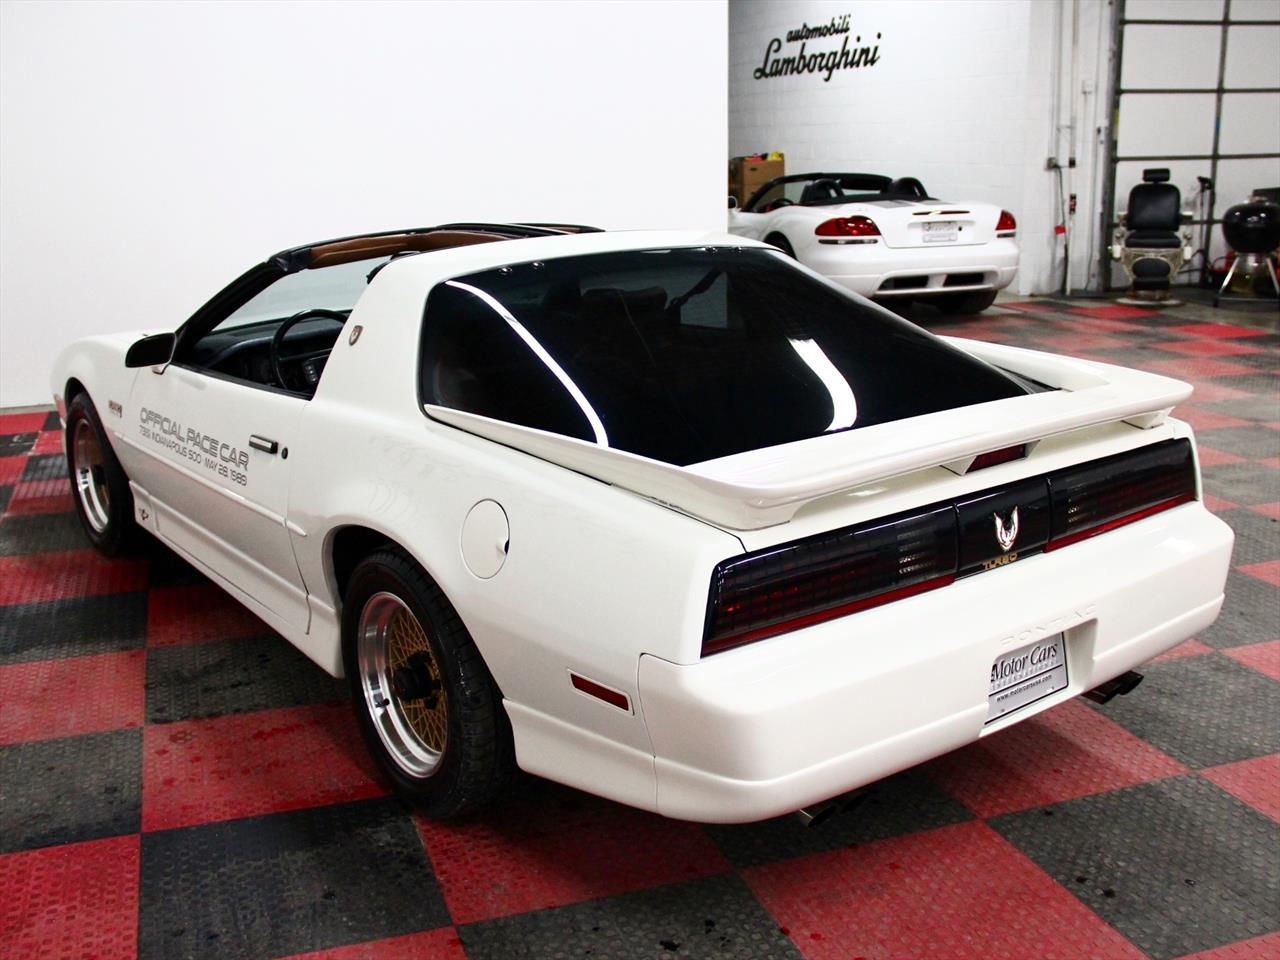 1989 pontiac firebird trans am pace car. Black Bedroom Furniture Sets. Home Design Ideas